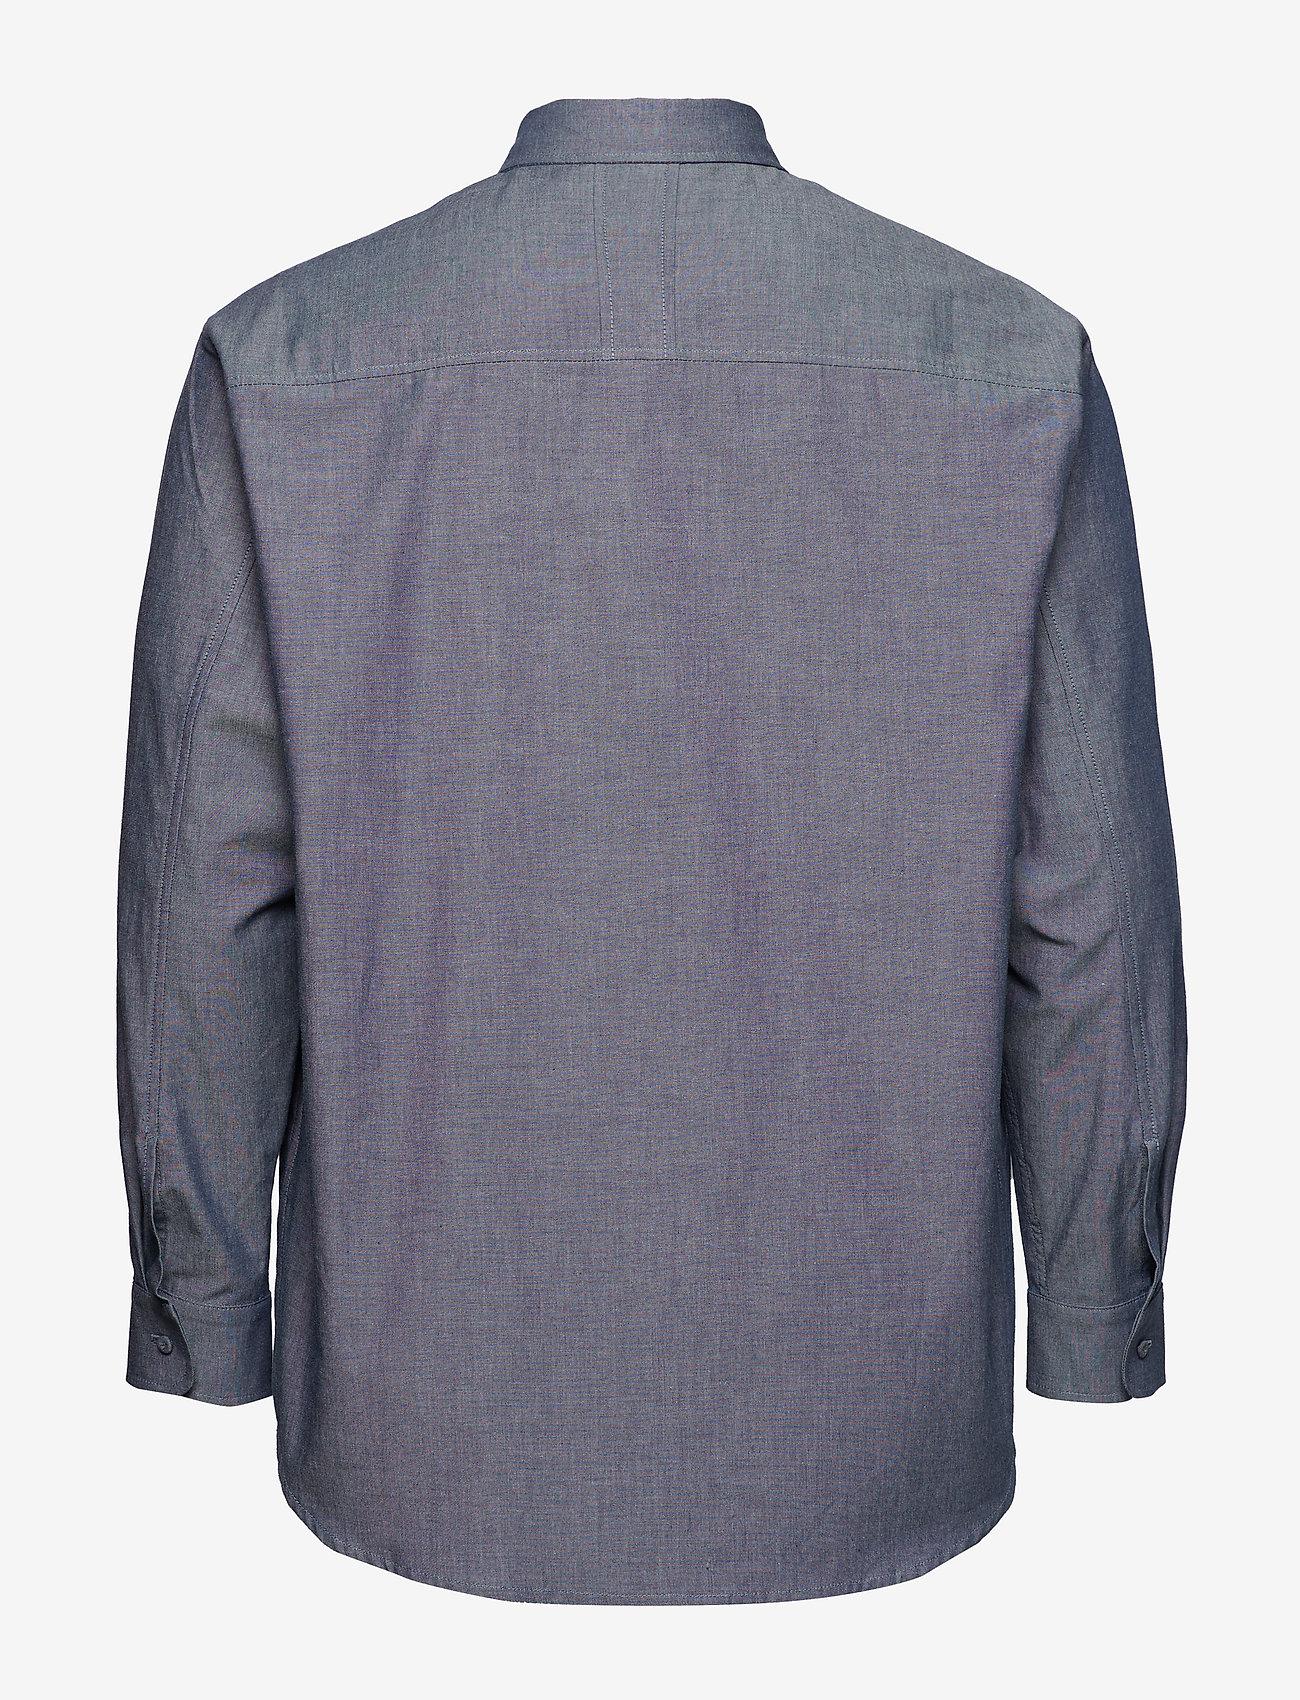 Oversize Shirt (Dark Indigo) - Tonsure oCHvR9